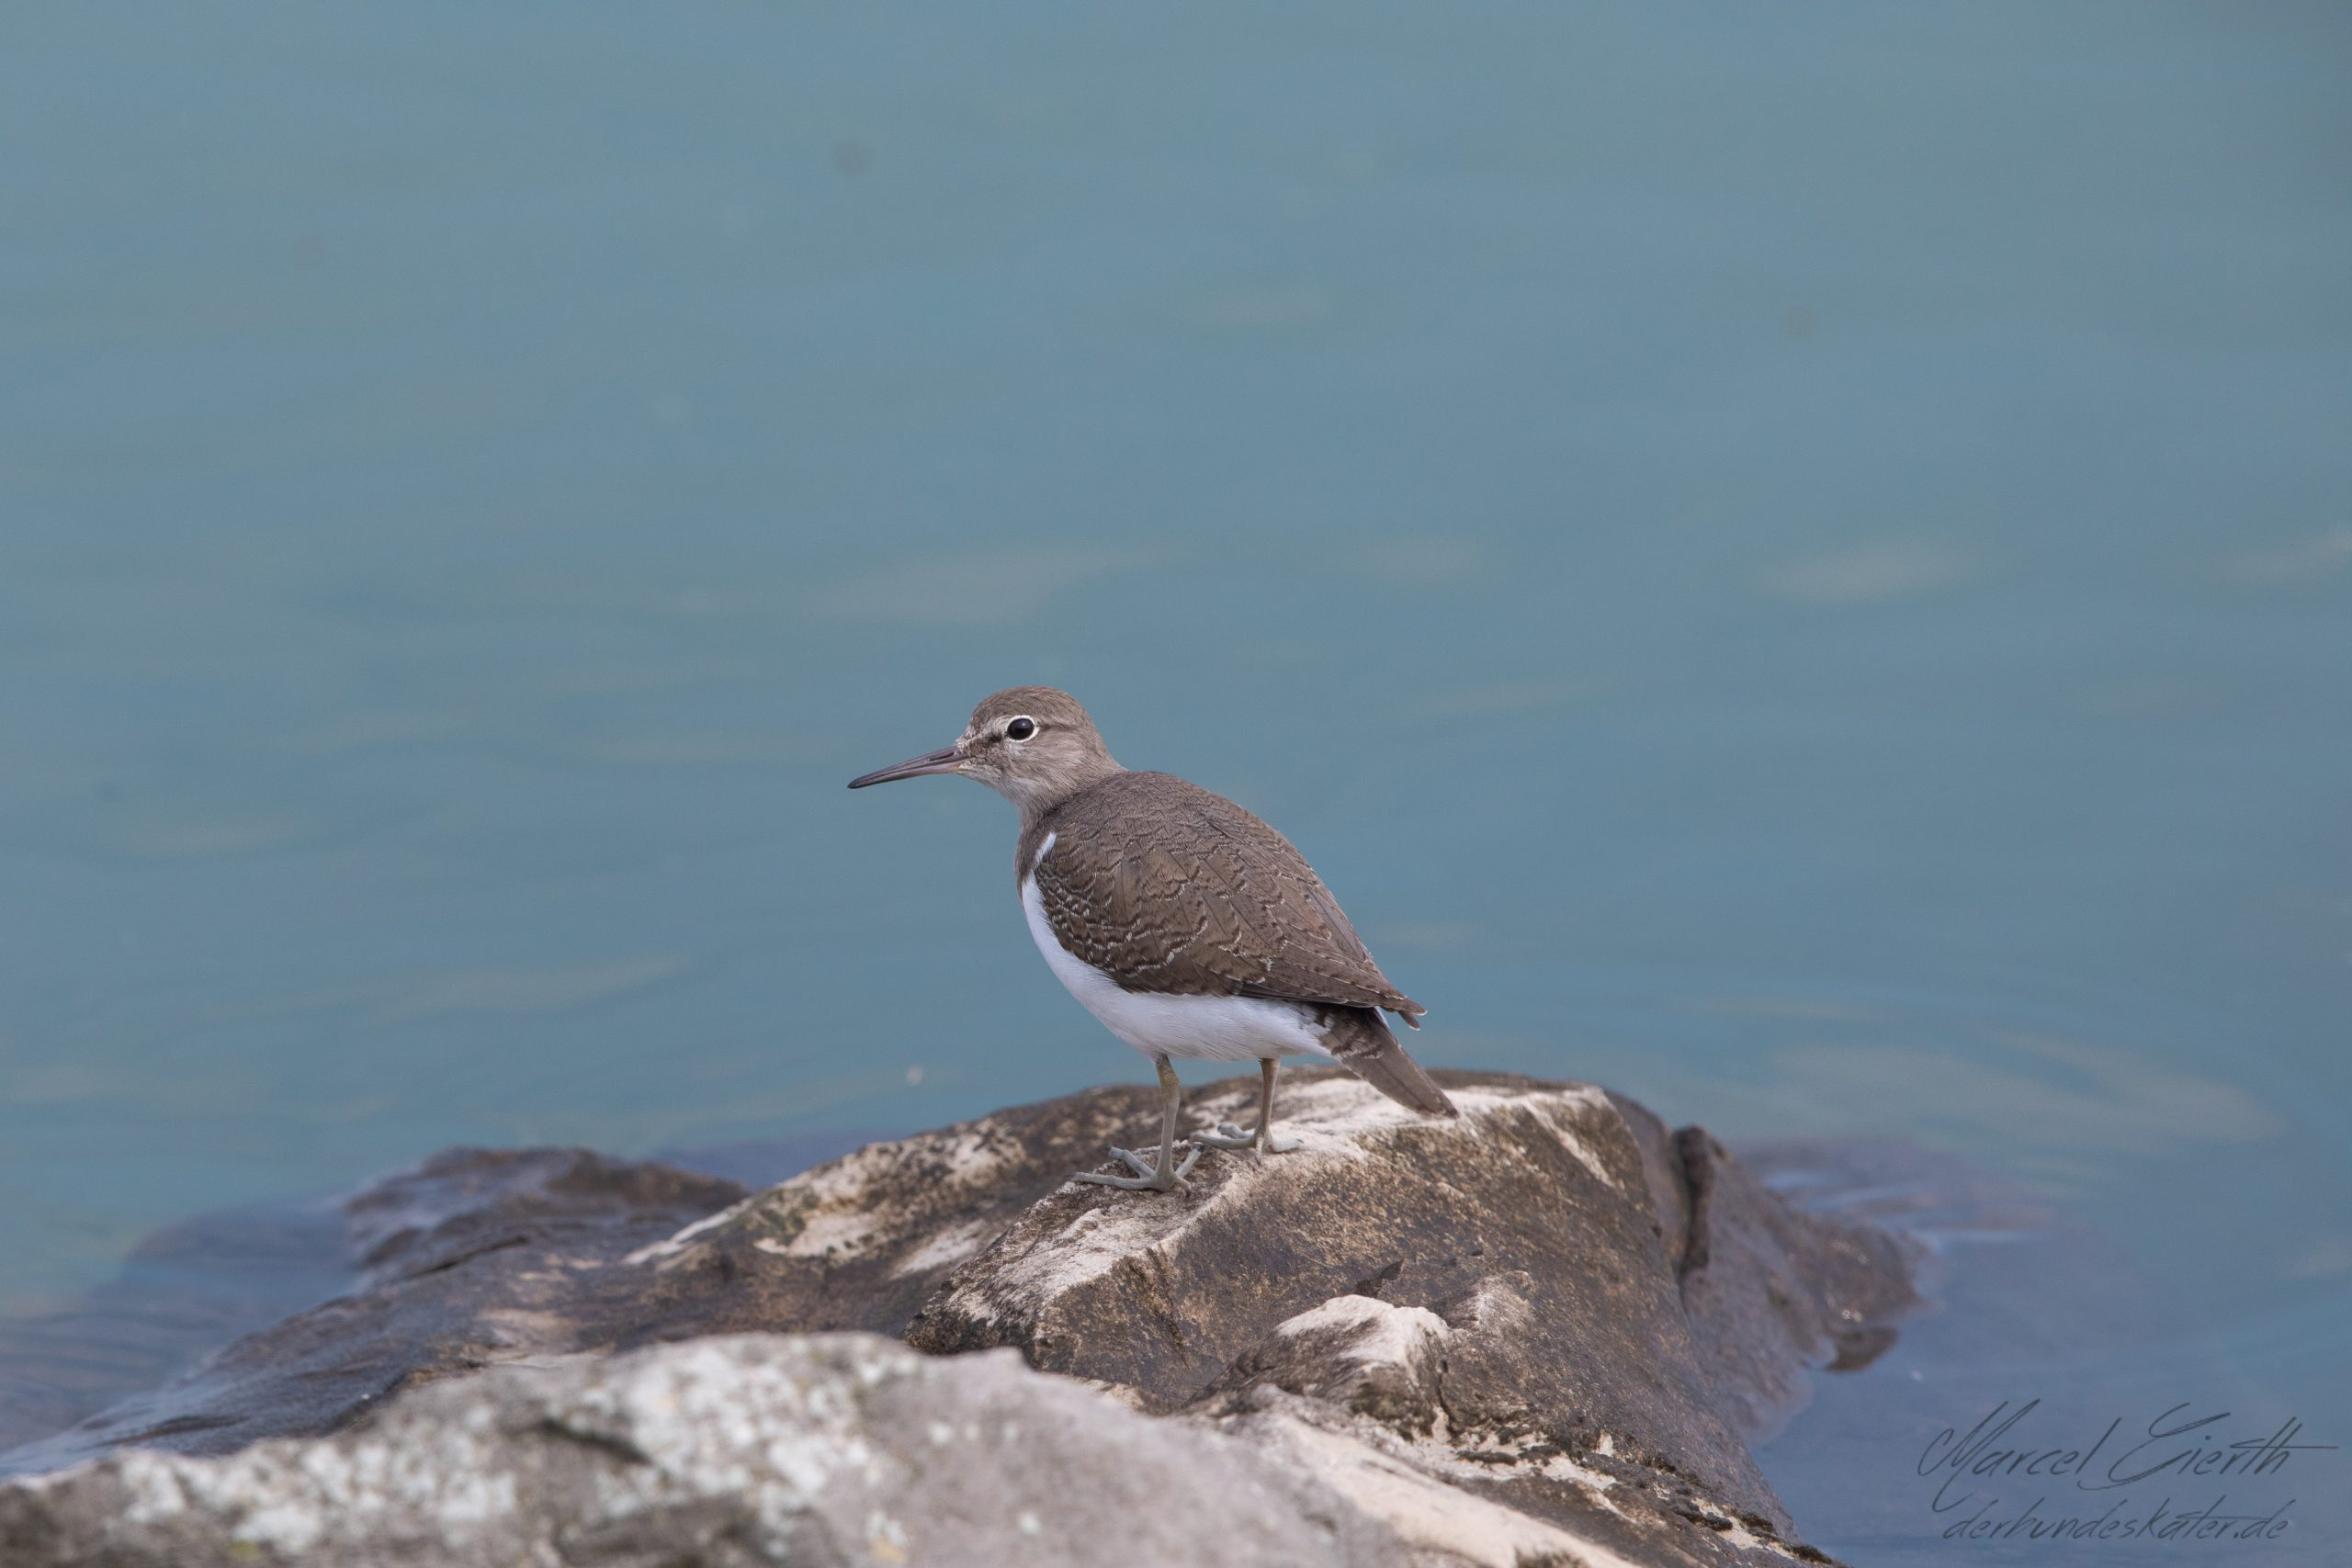 Flussuferlaeufer - Common Sandpiper - Actitis hypoleucos - Fotograf Marcel Gierth